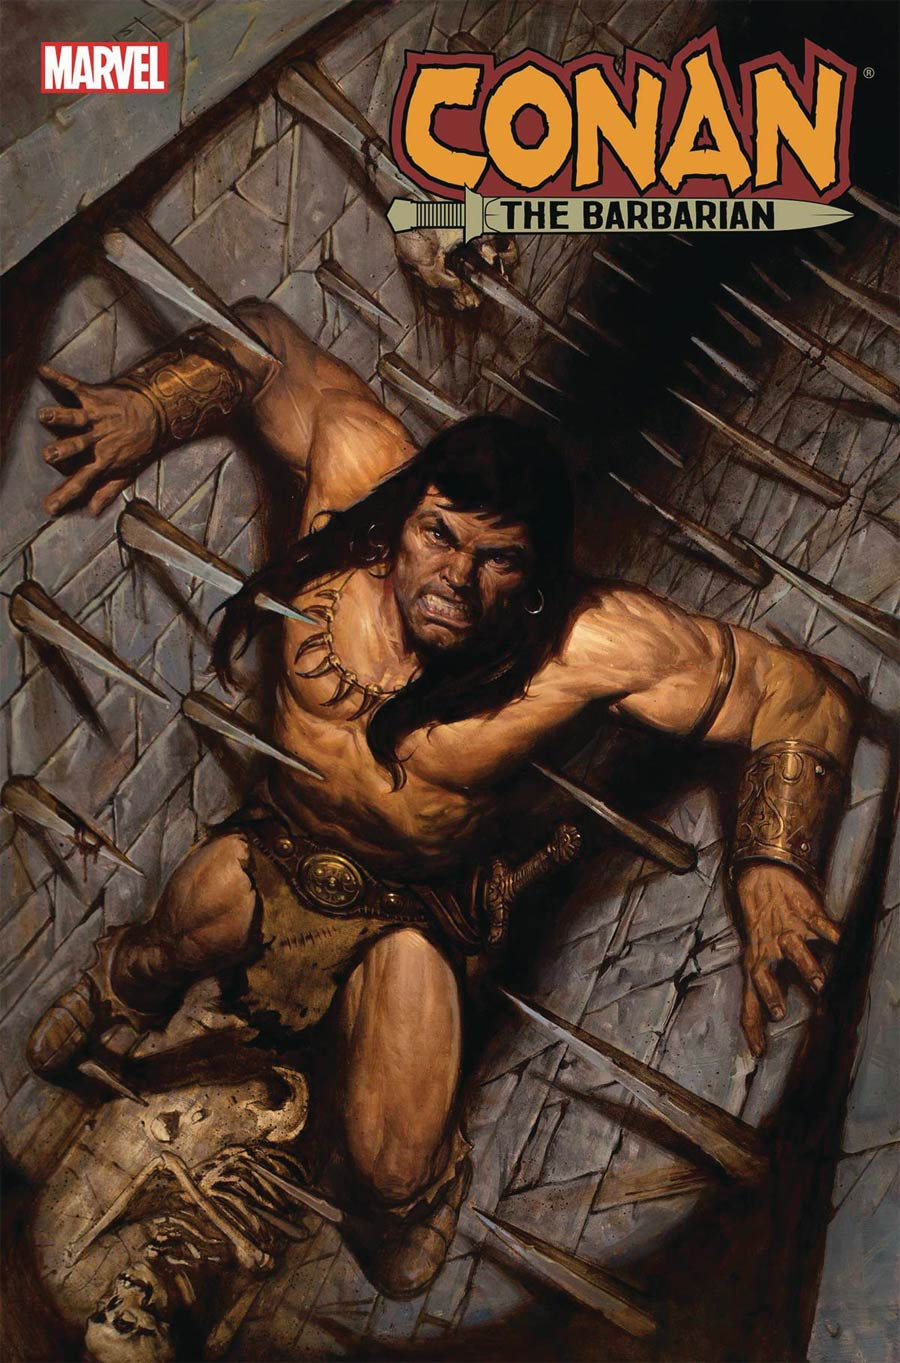 Conan The Barbarian Vol 4 #15 Cover A Regular EM Gist Cover